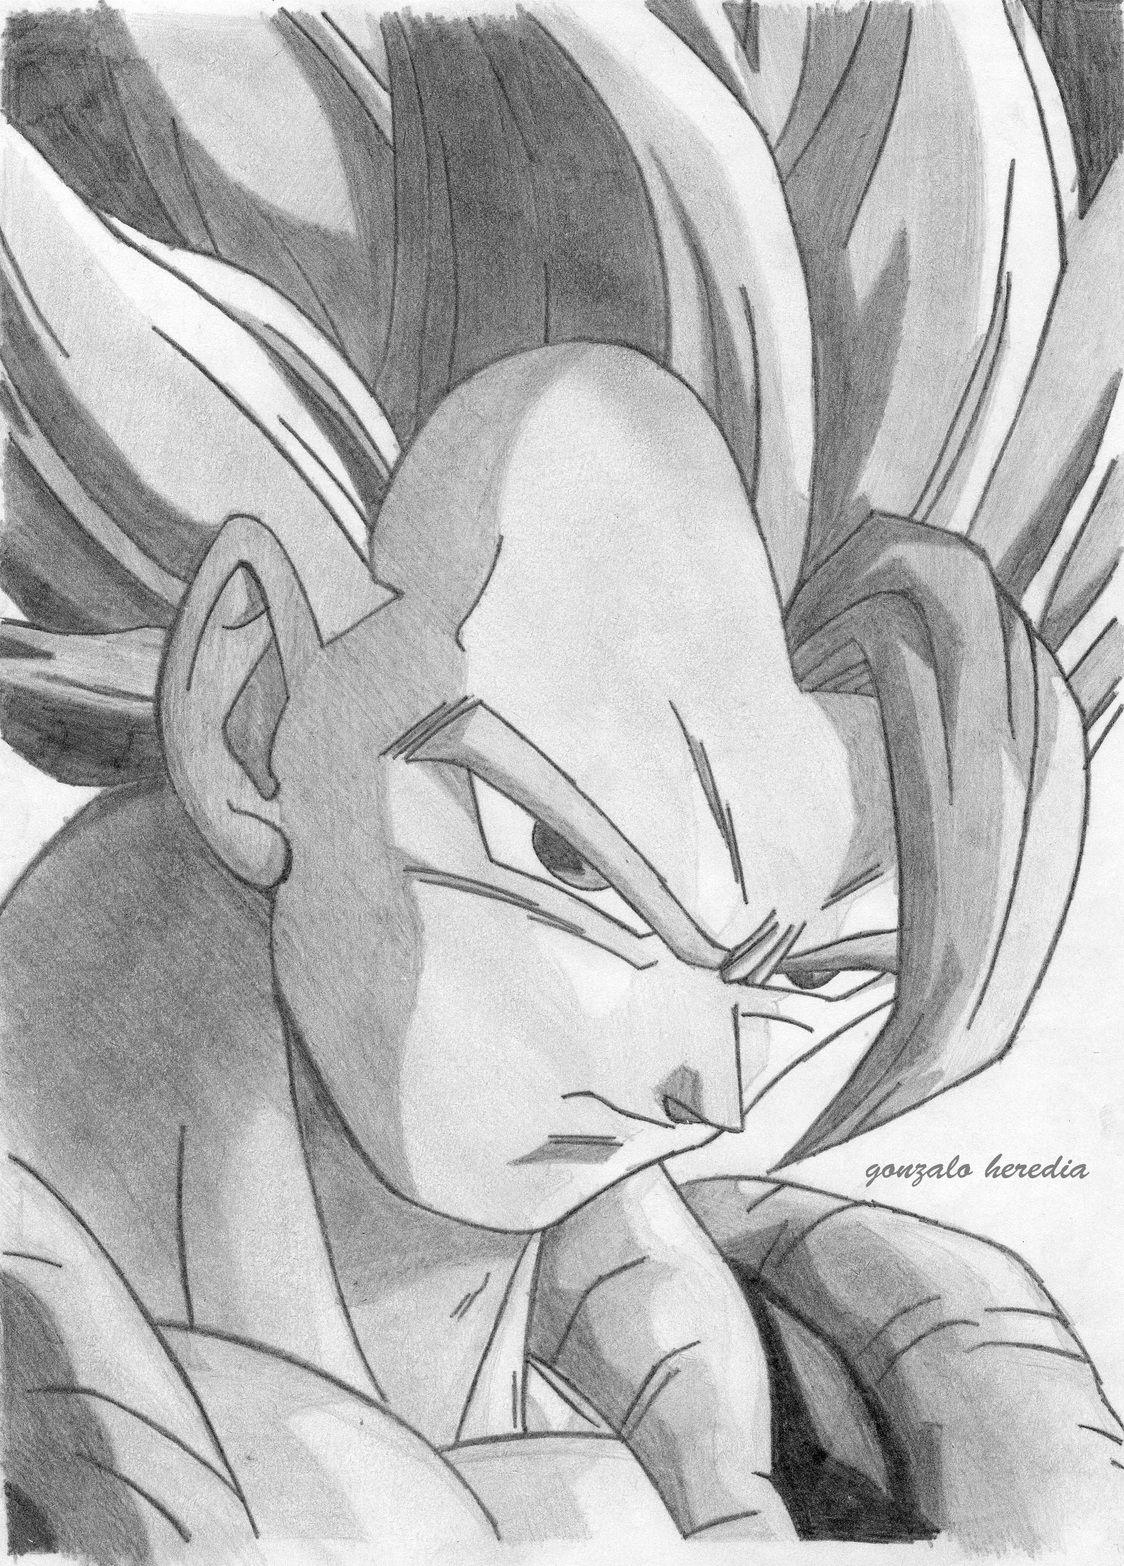 Dibujos De Perros A Lapiz Dibujos Dibujos A Lapiz Tumblr Goku Dibujo A Lapiz